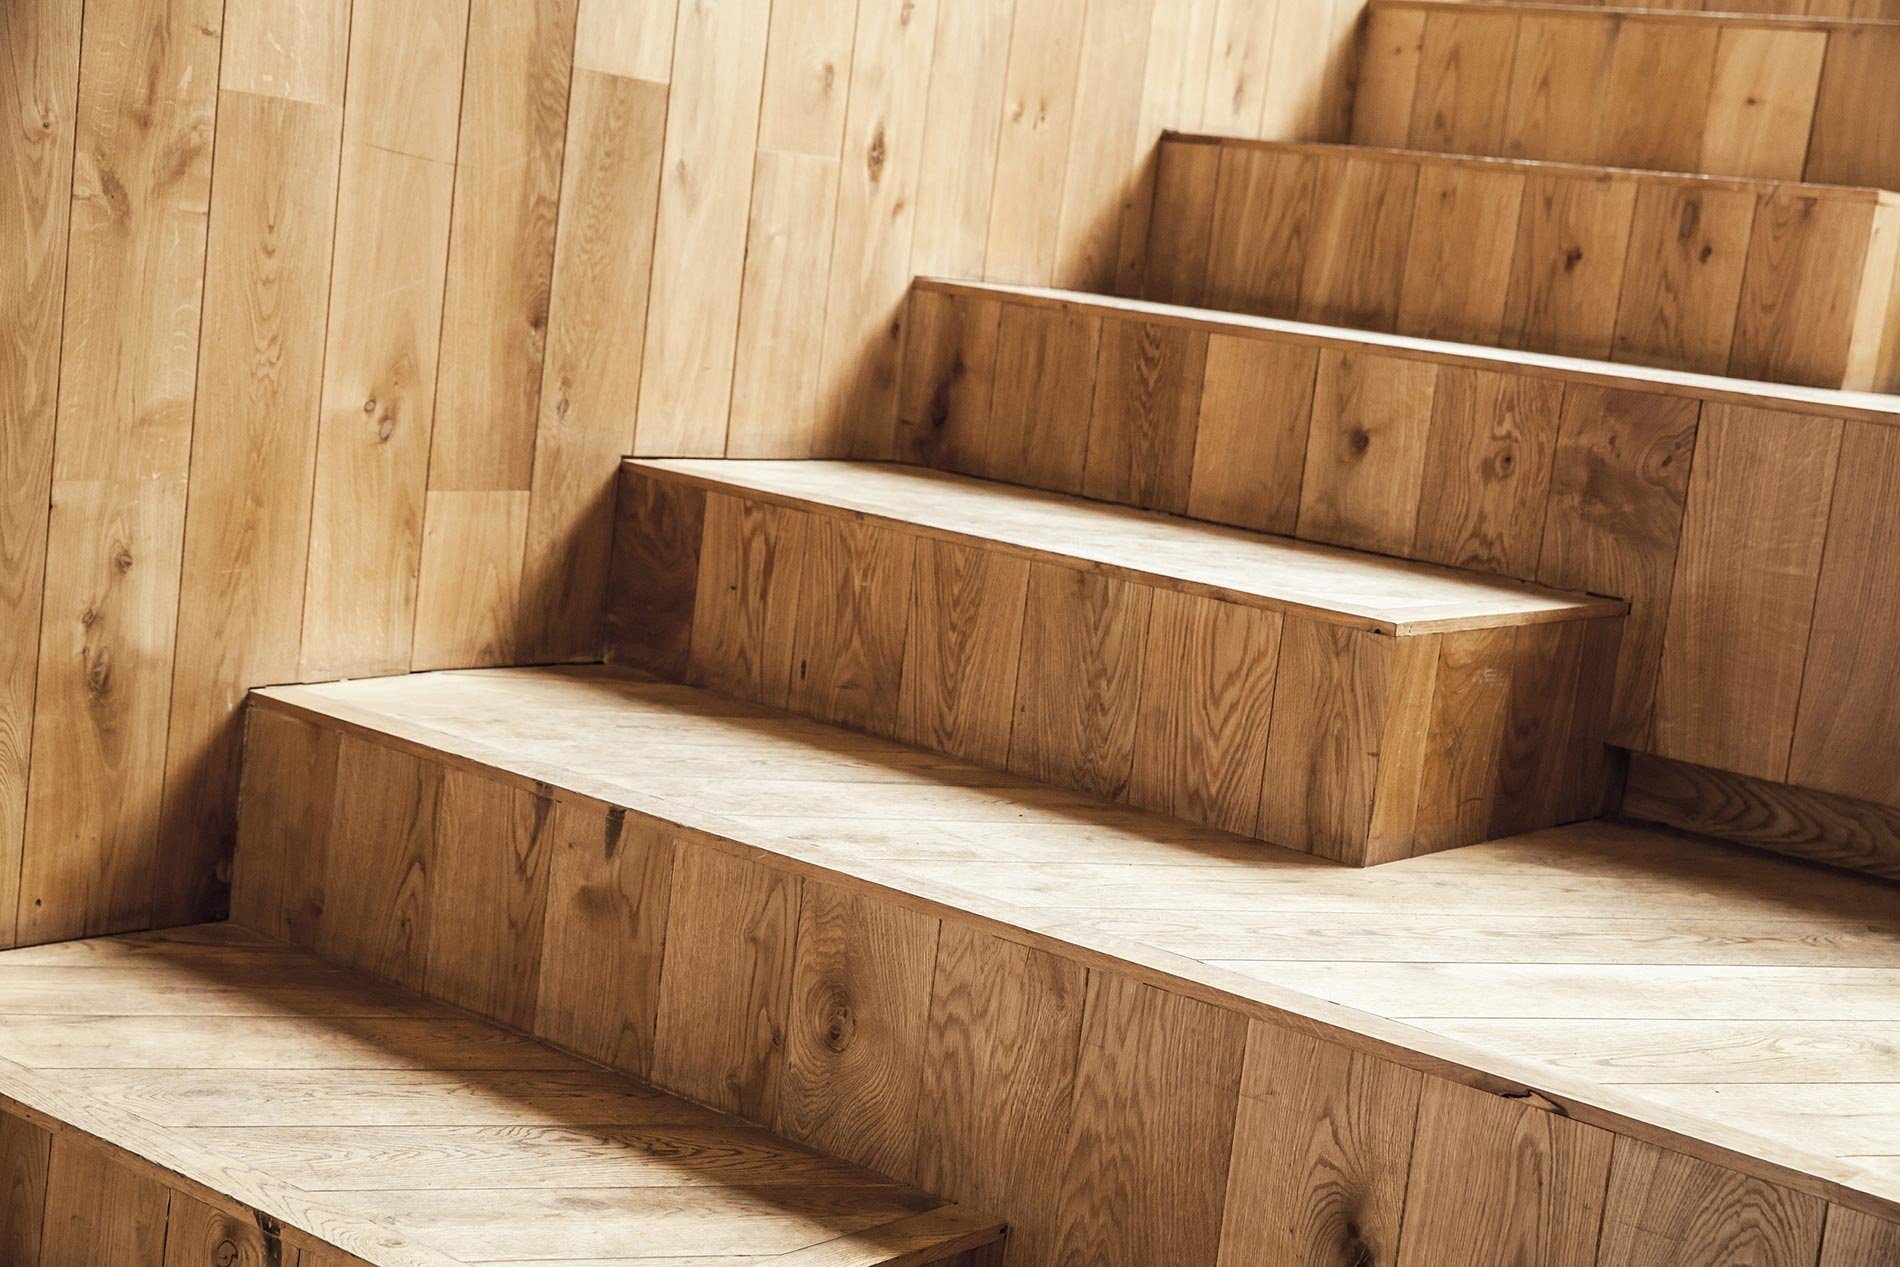 Escalier bois : Choisir son essence